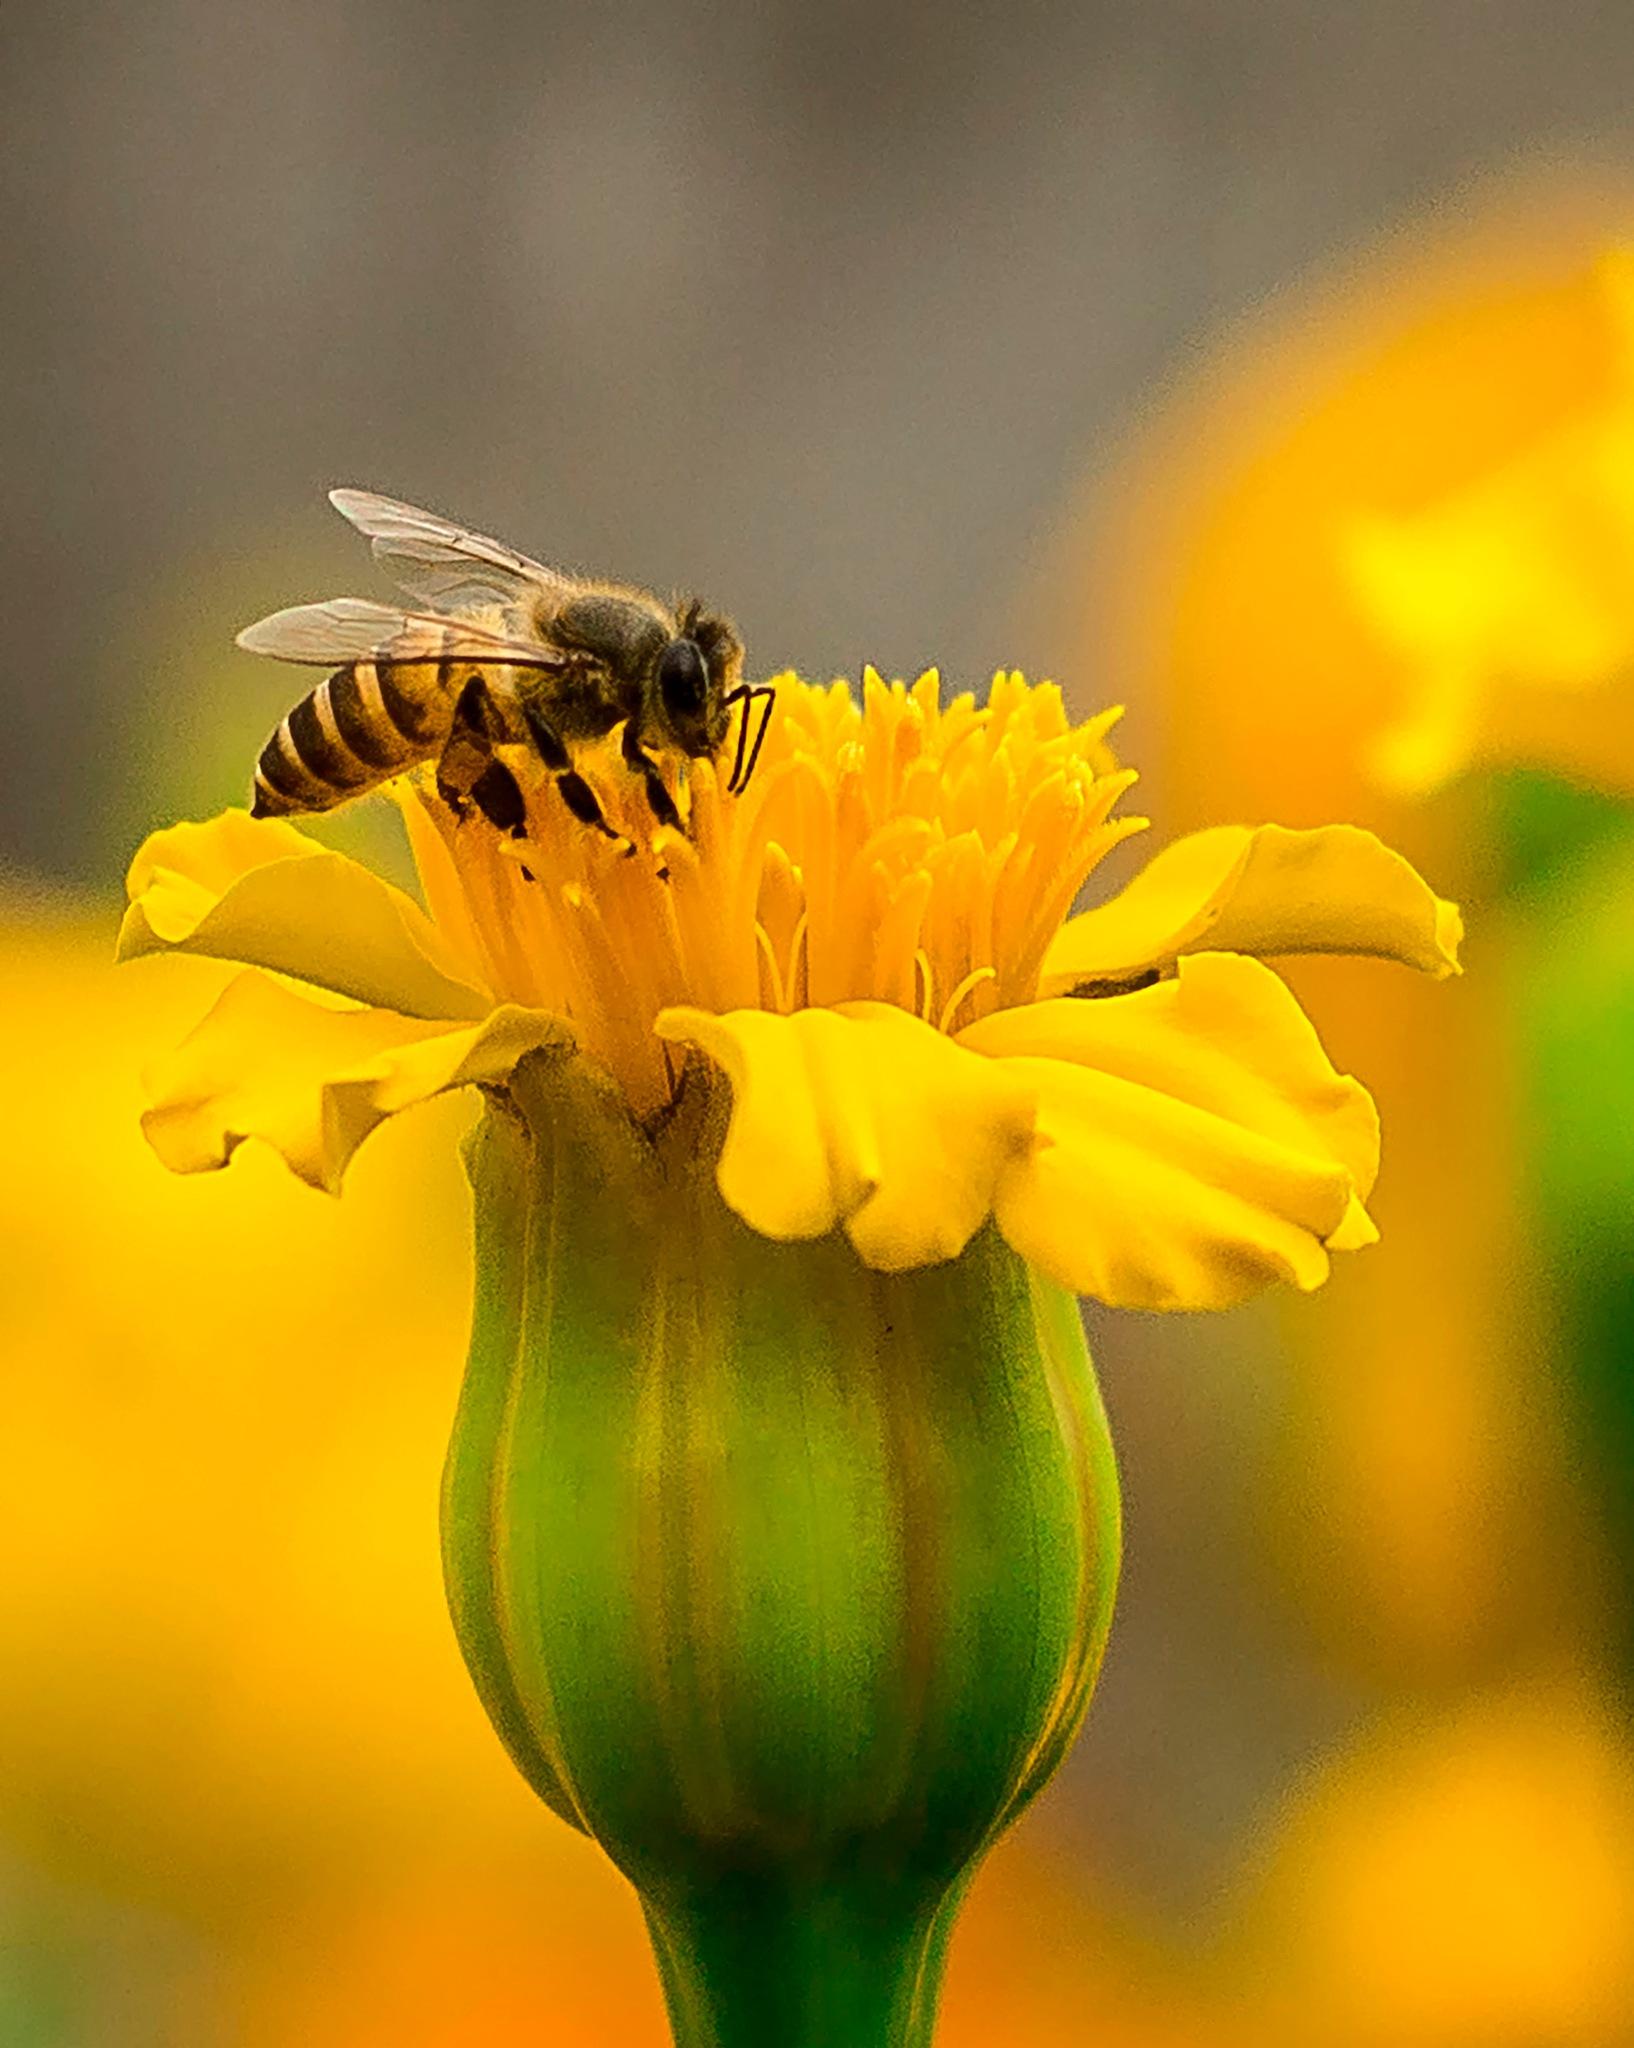 The bee by Ehsanul Siddiq Aranya